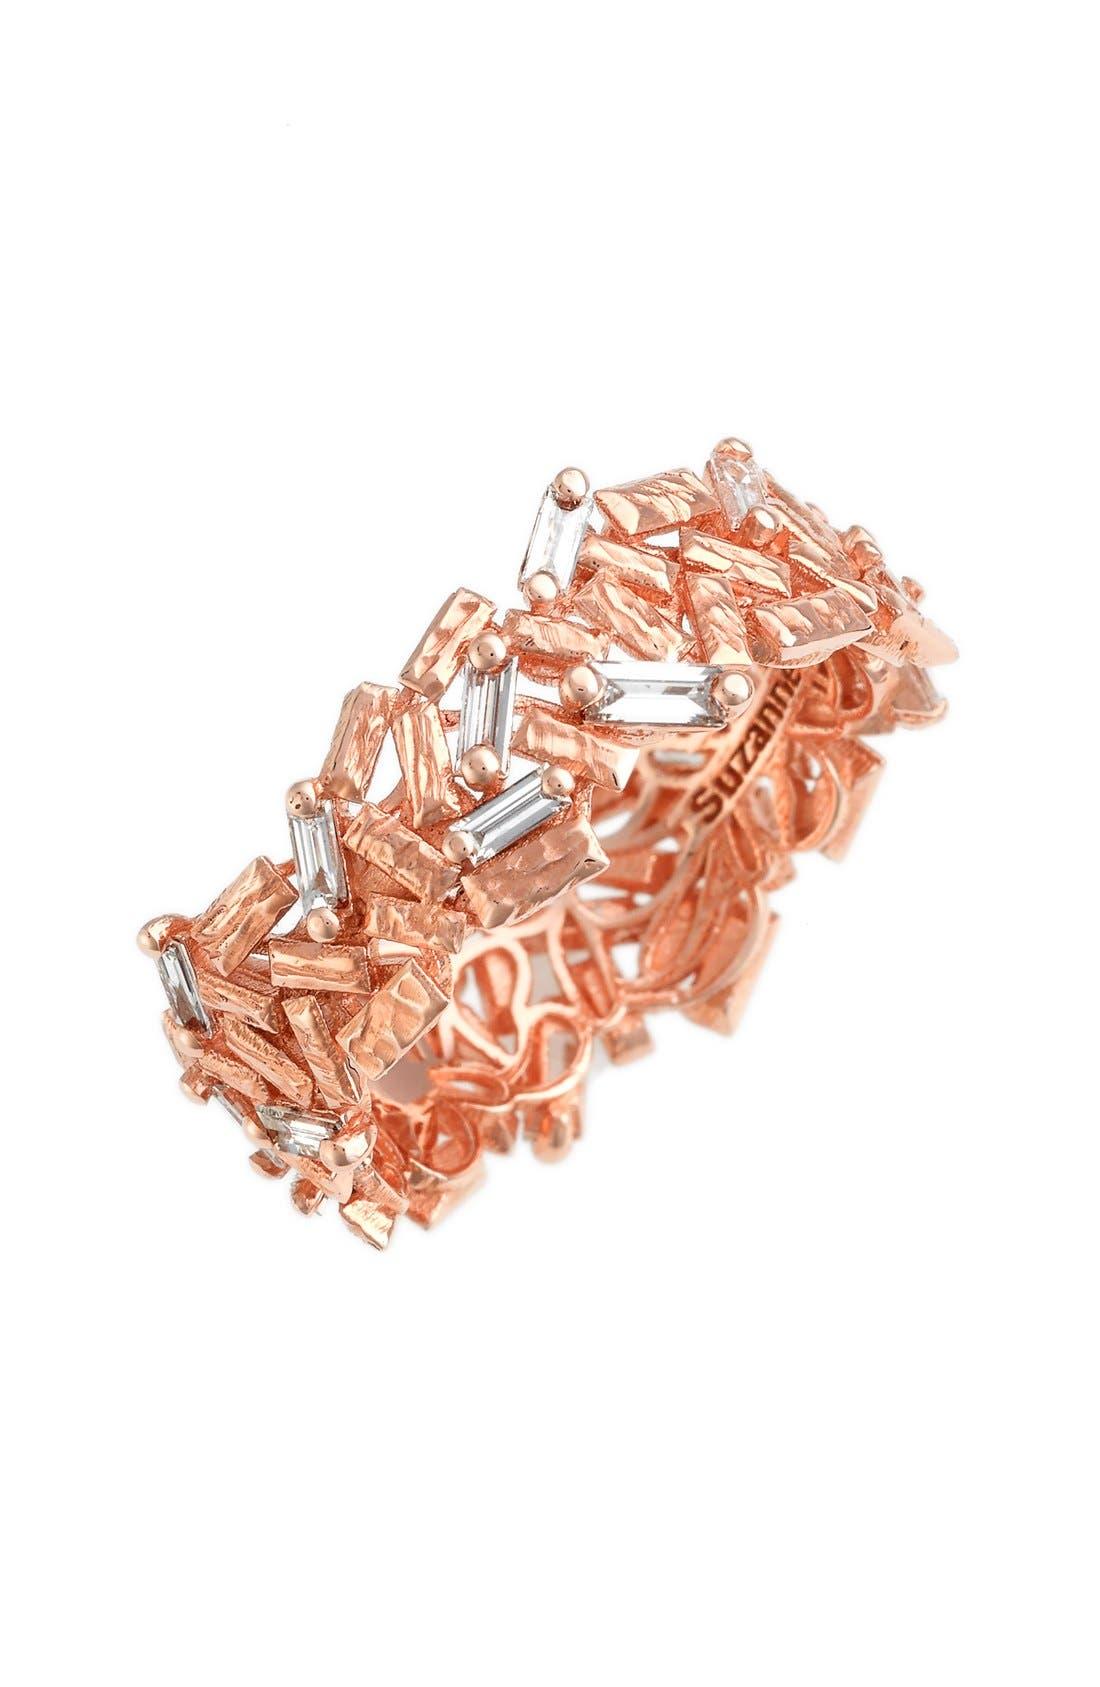 Main Image - Suzanne Kalan 'Firework' Baguette Diamond Eternity Ring